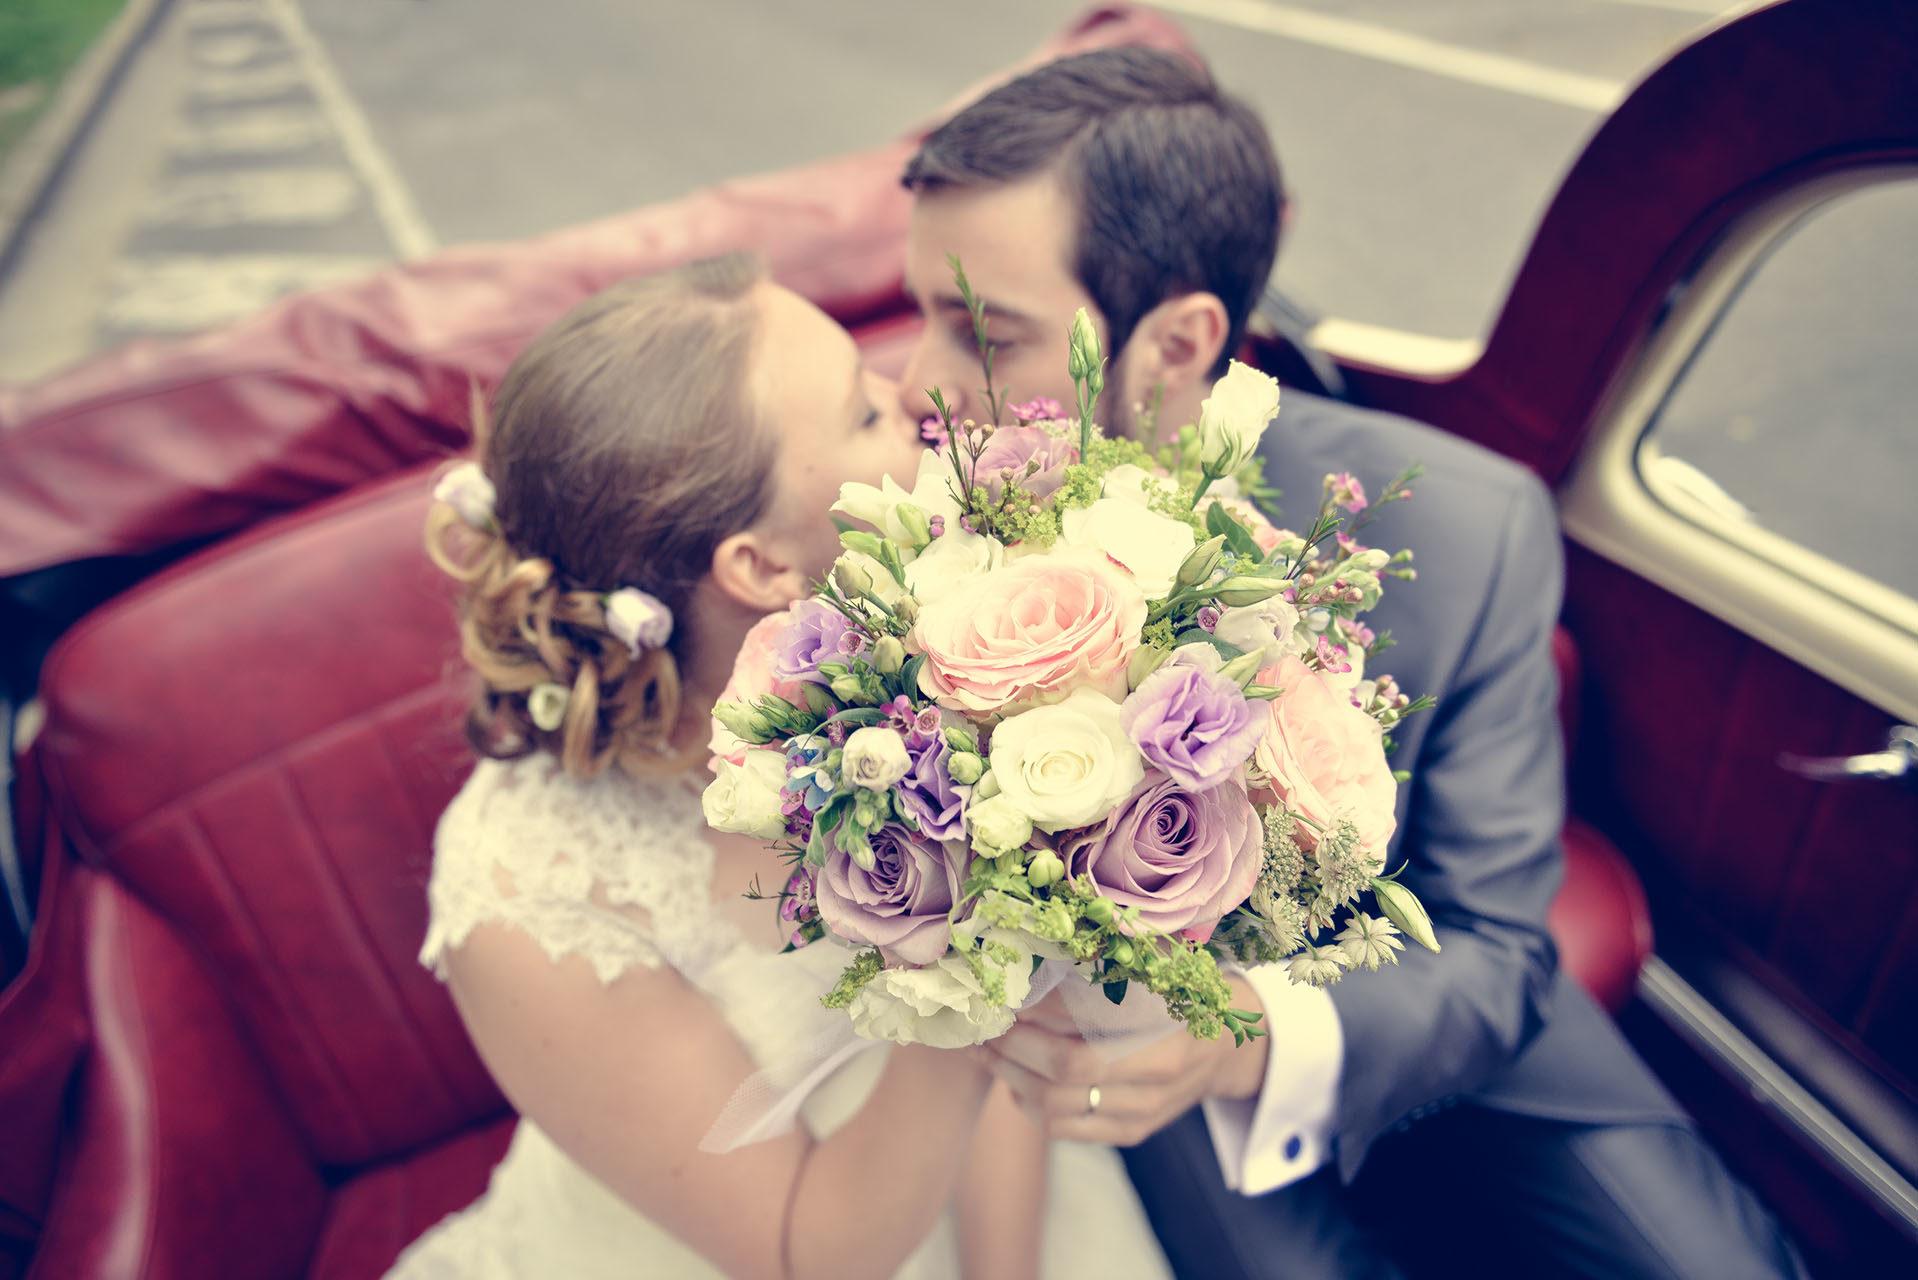 photographe-mariage-ile-de-france-paris-maya-angelsen